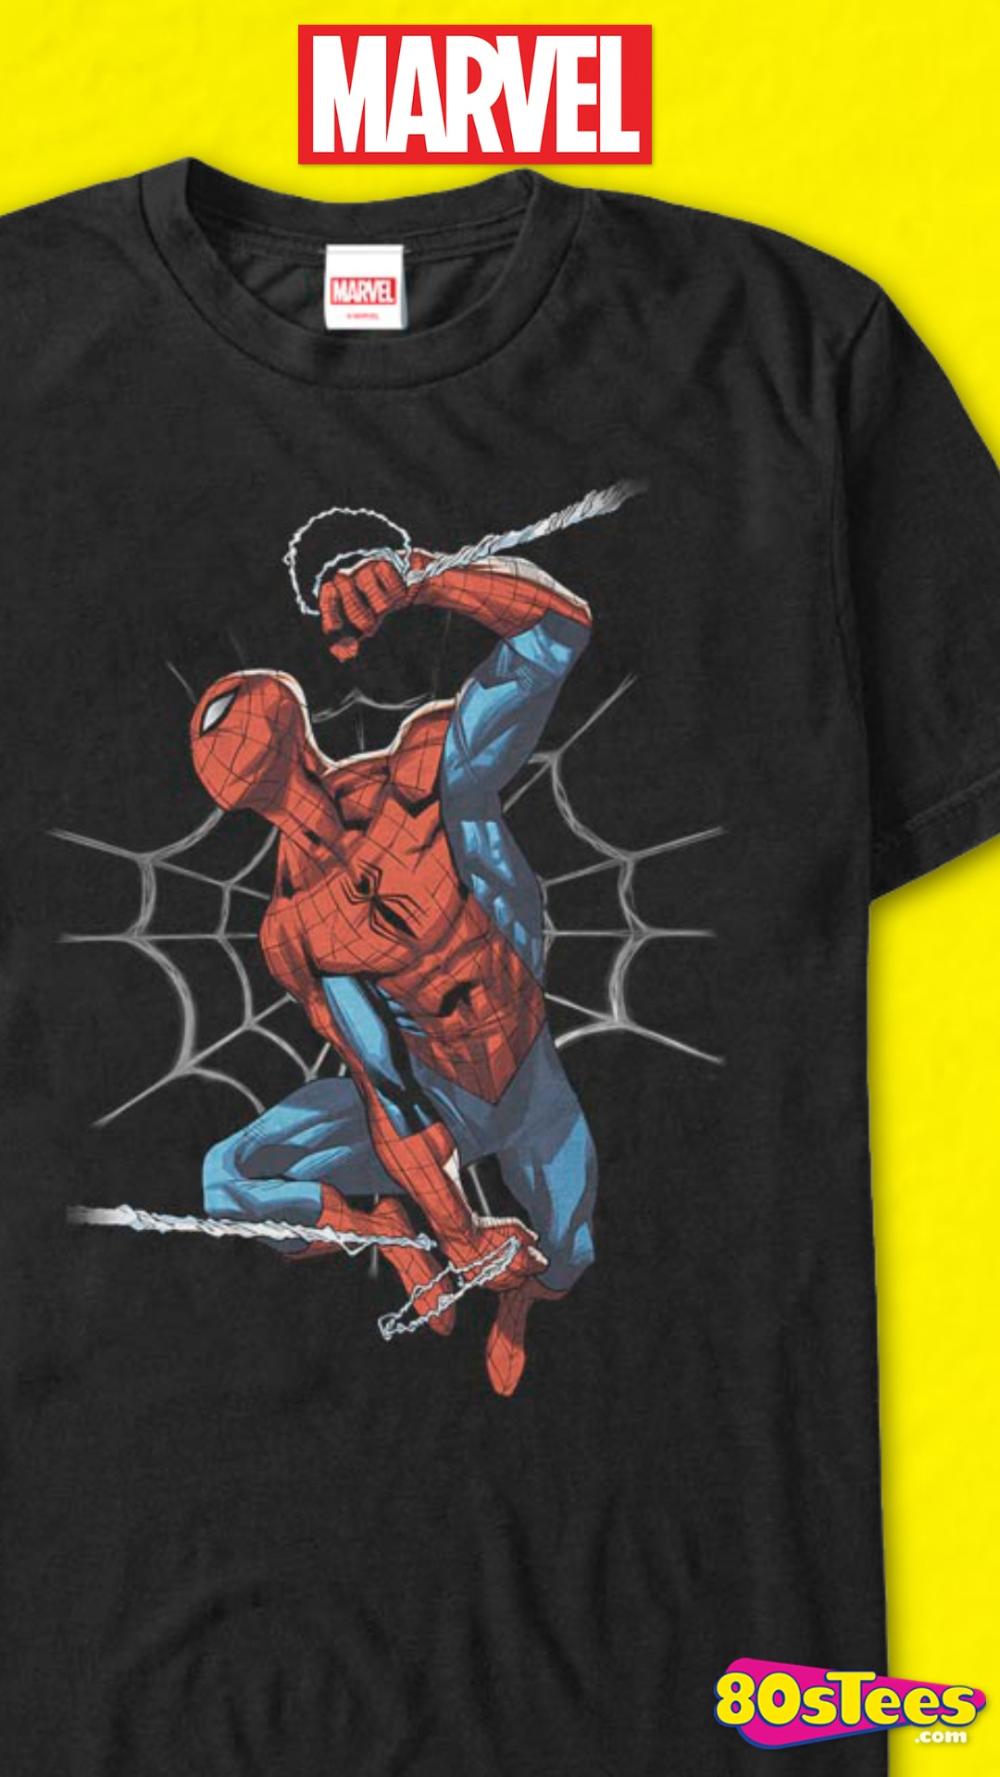 Adult Men/'s Marvel Comics The Amazing Spider-Man Red Spider Logo Black T-Shirt